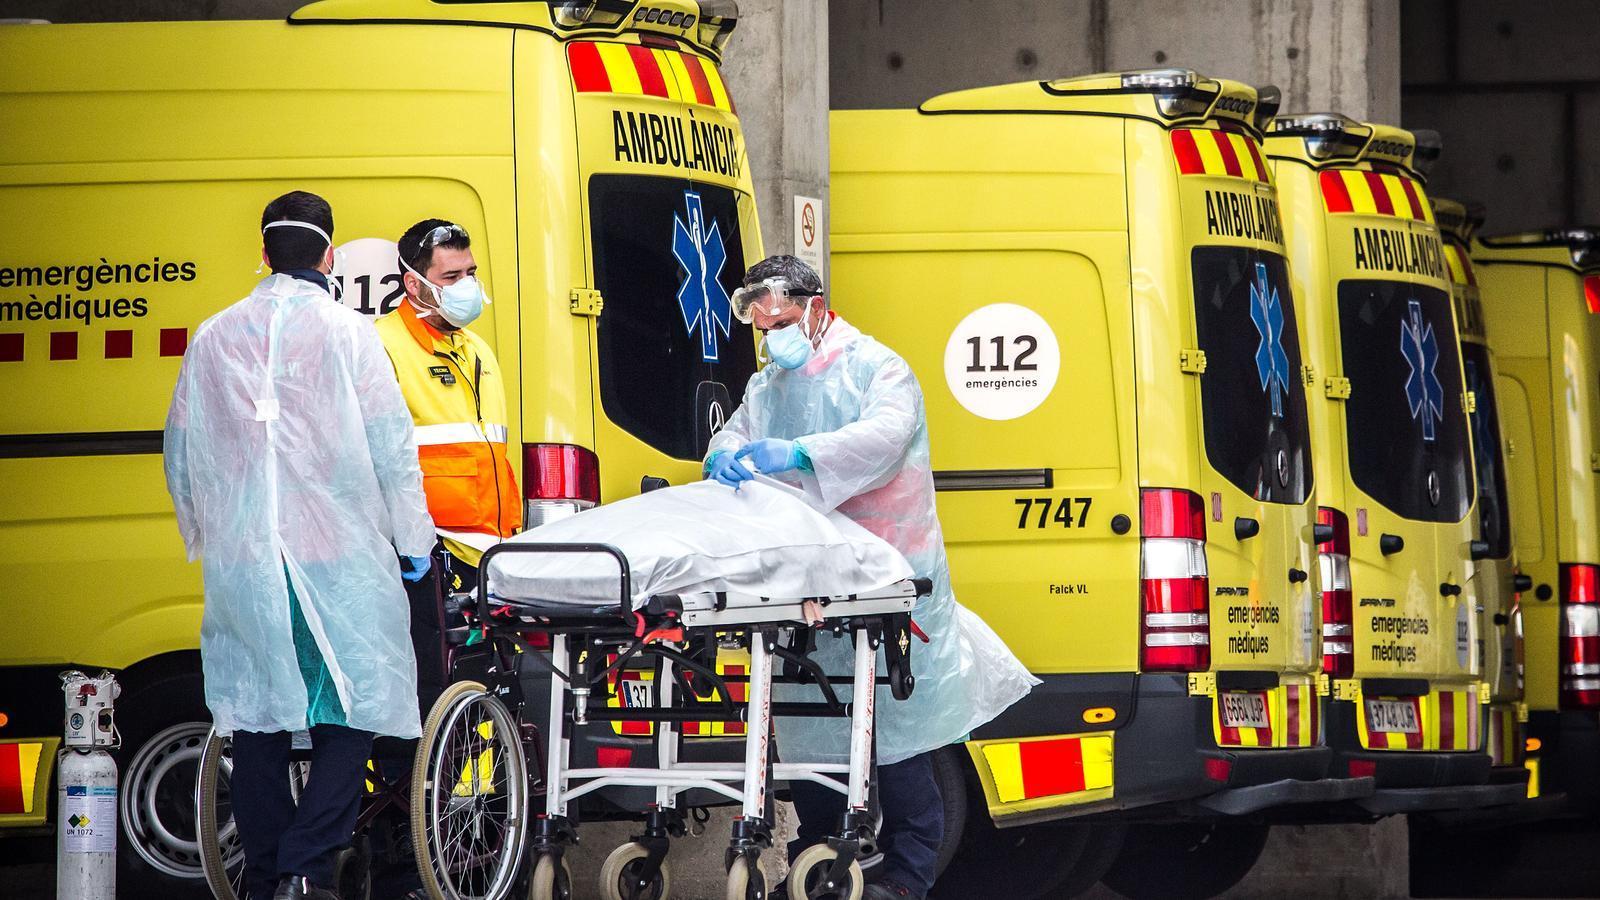 70 científics avisen que dimecres es podria col·lapsar el sistema sanitari